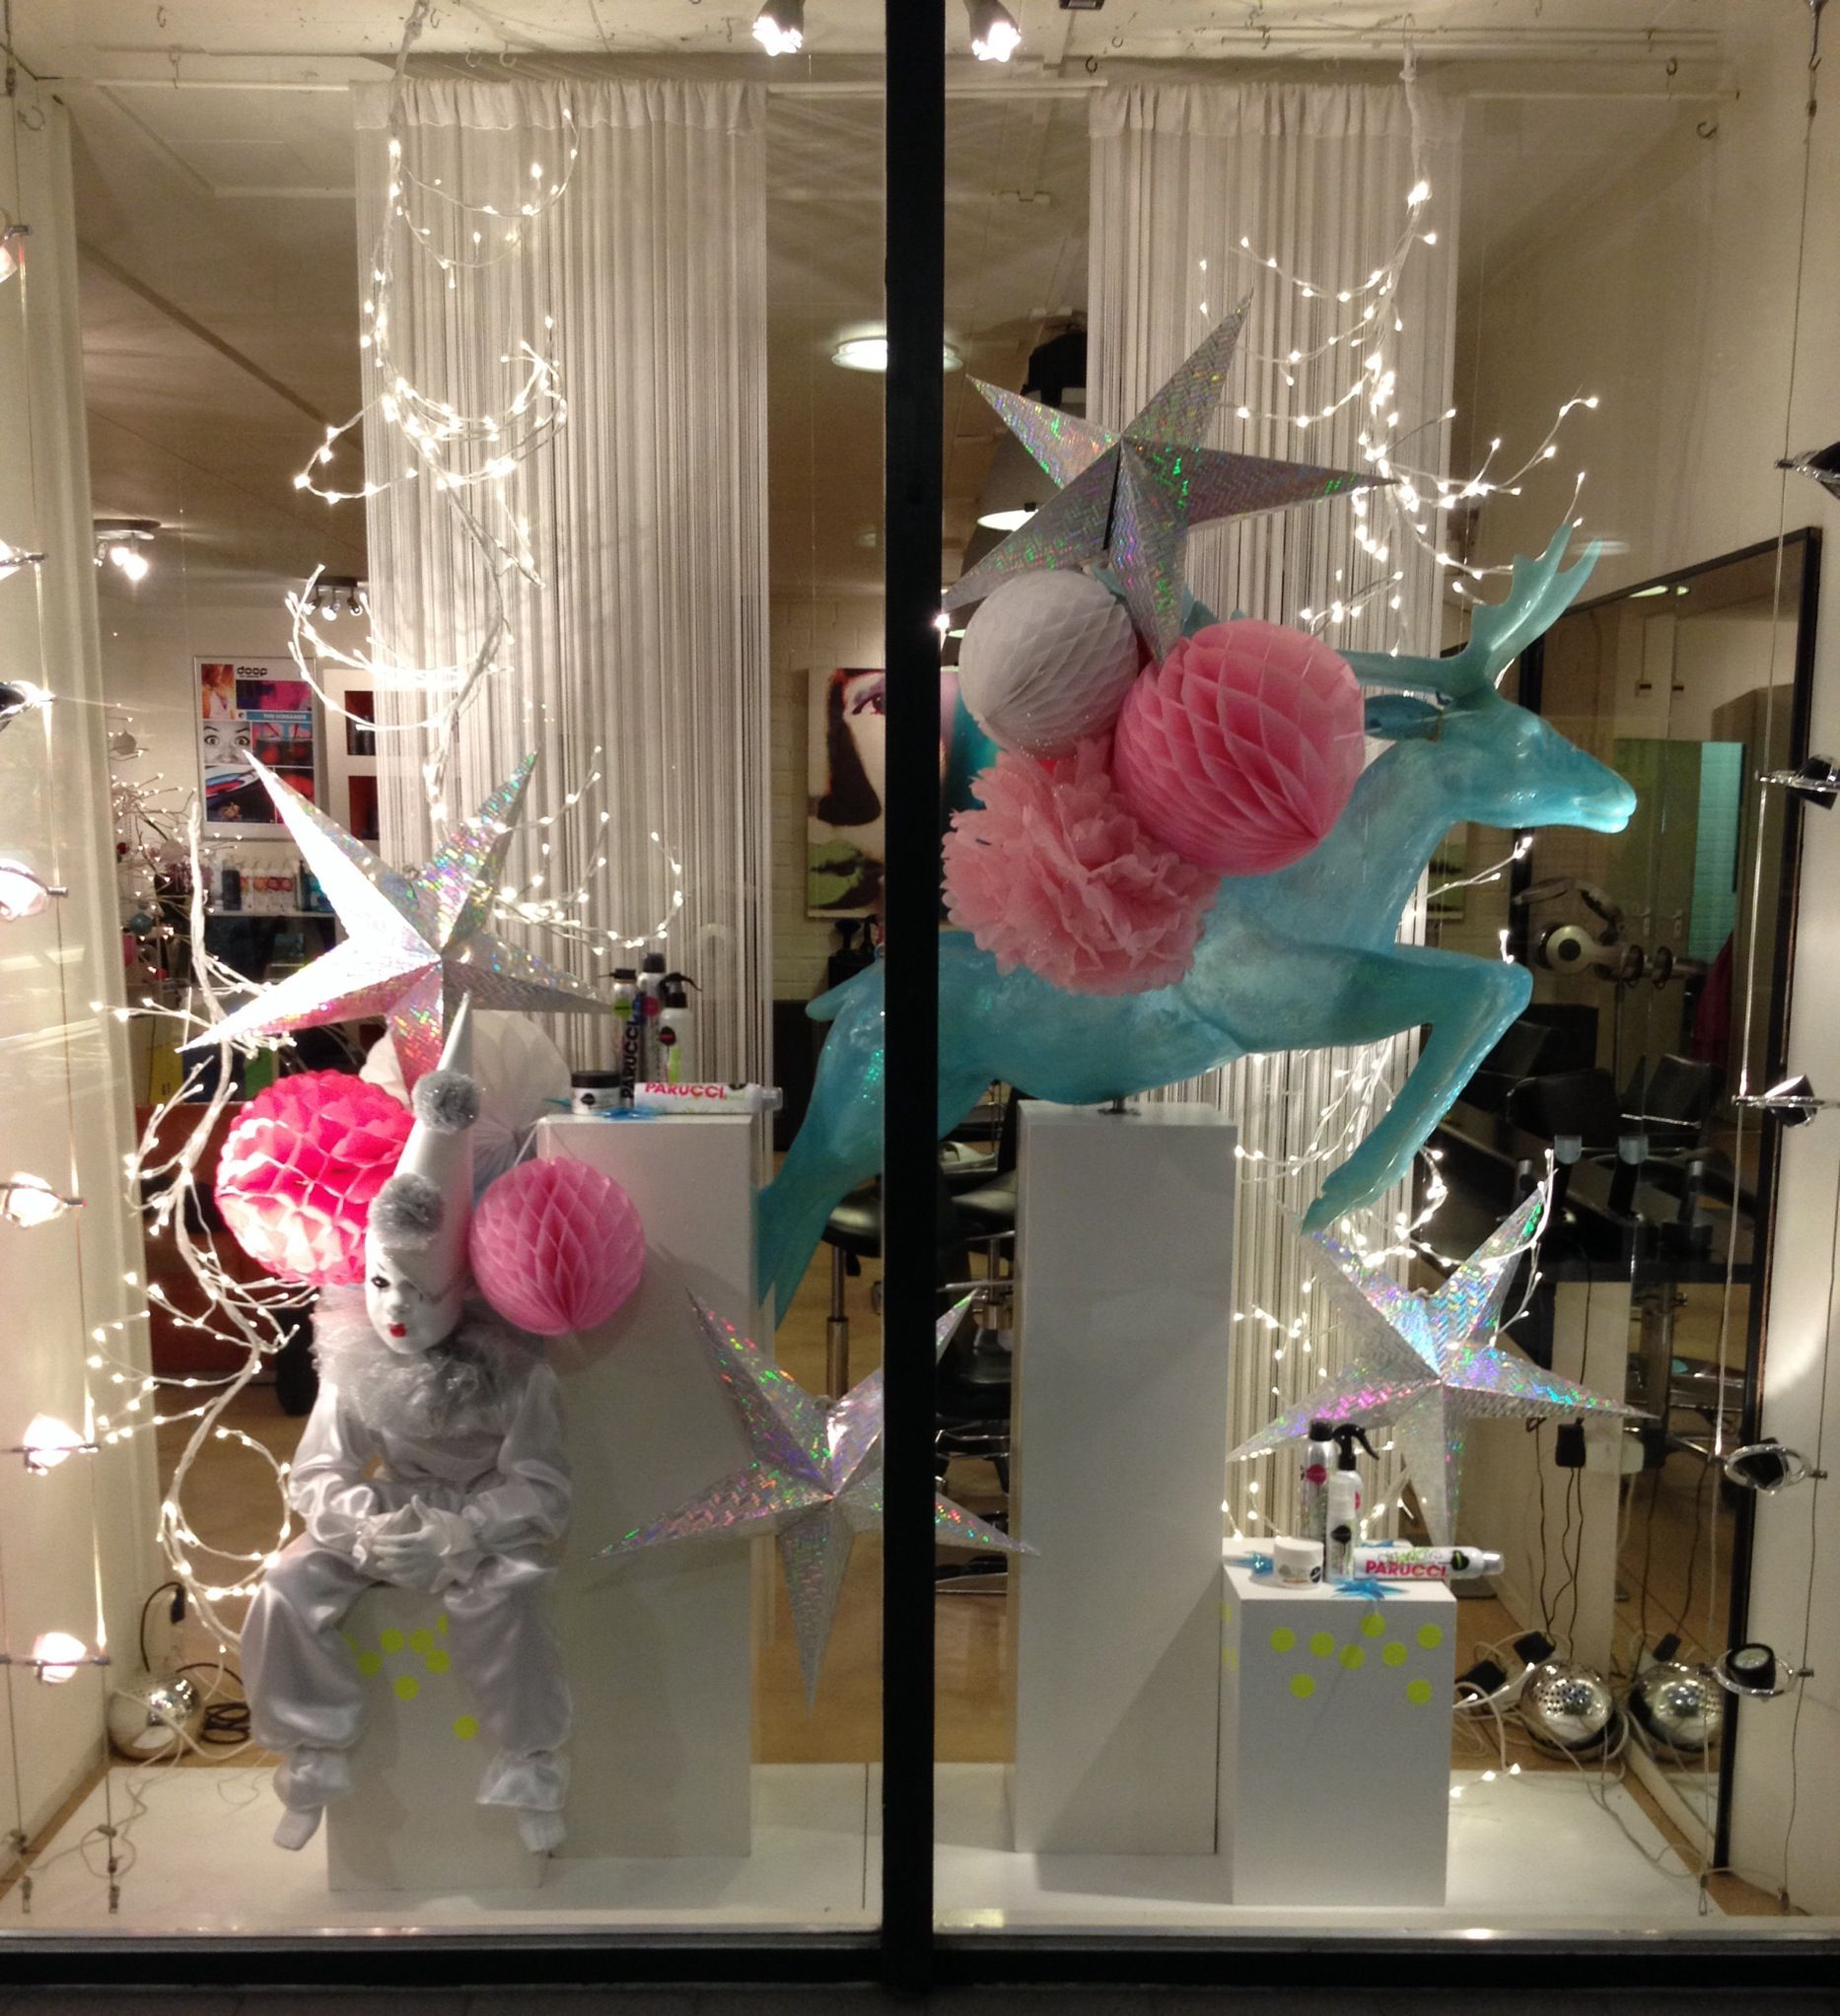 Etaleur Kerst Rich Art Design Winkel Etalages Uitstalling Etalages Kerst